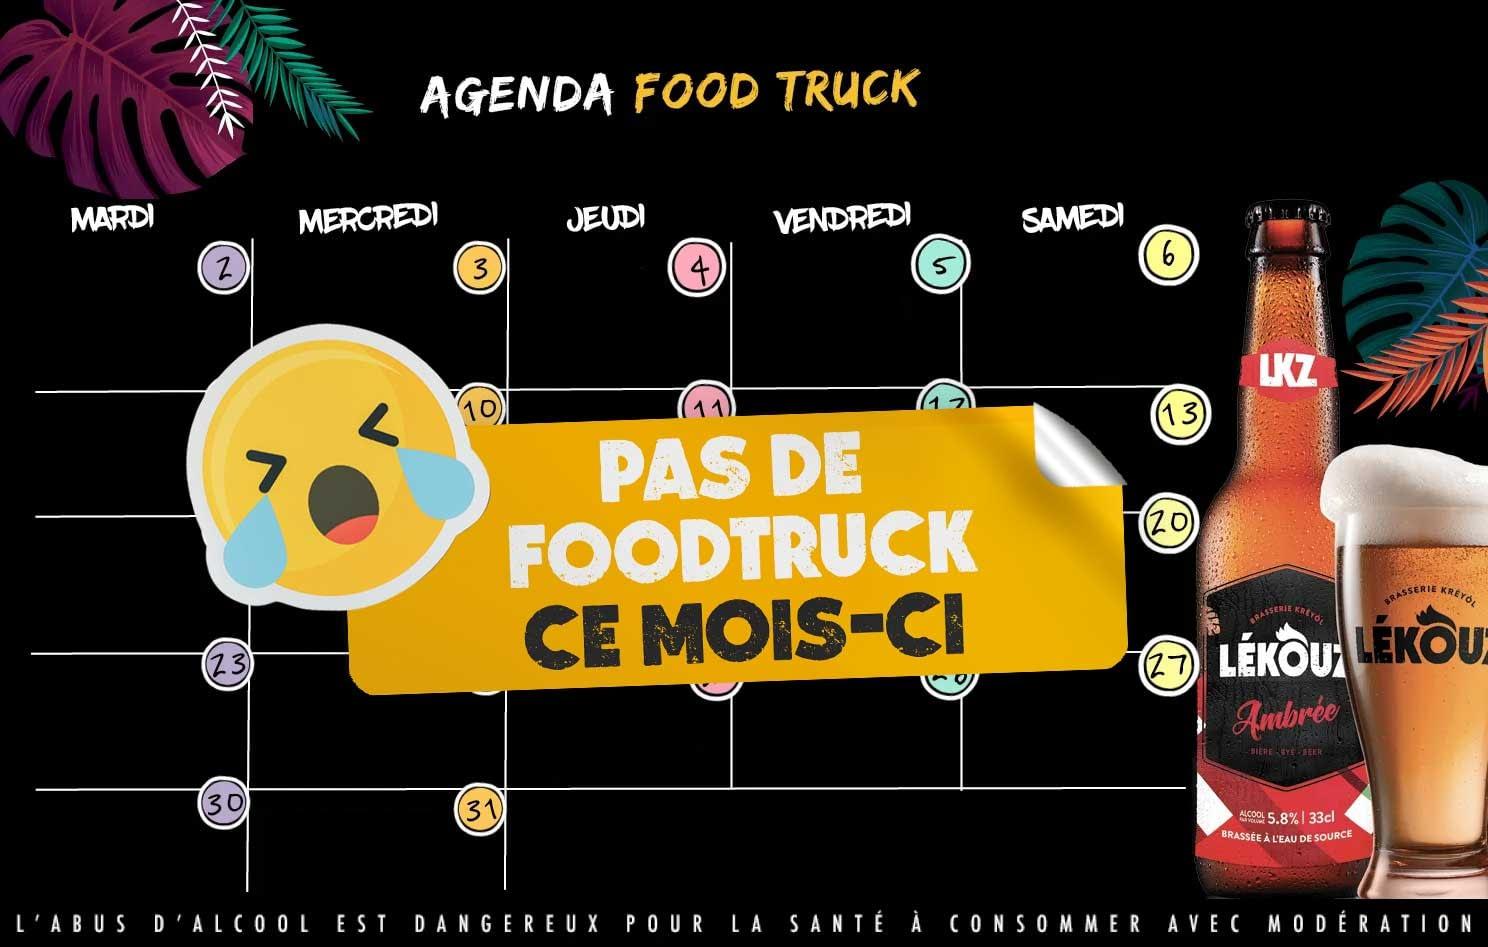 Lkz_Agenda_FoodTruck_SEPTEMBRE-2021